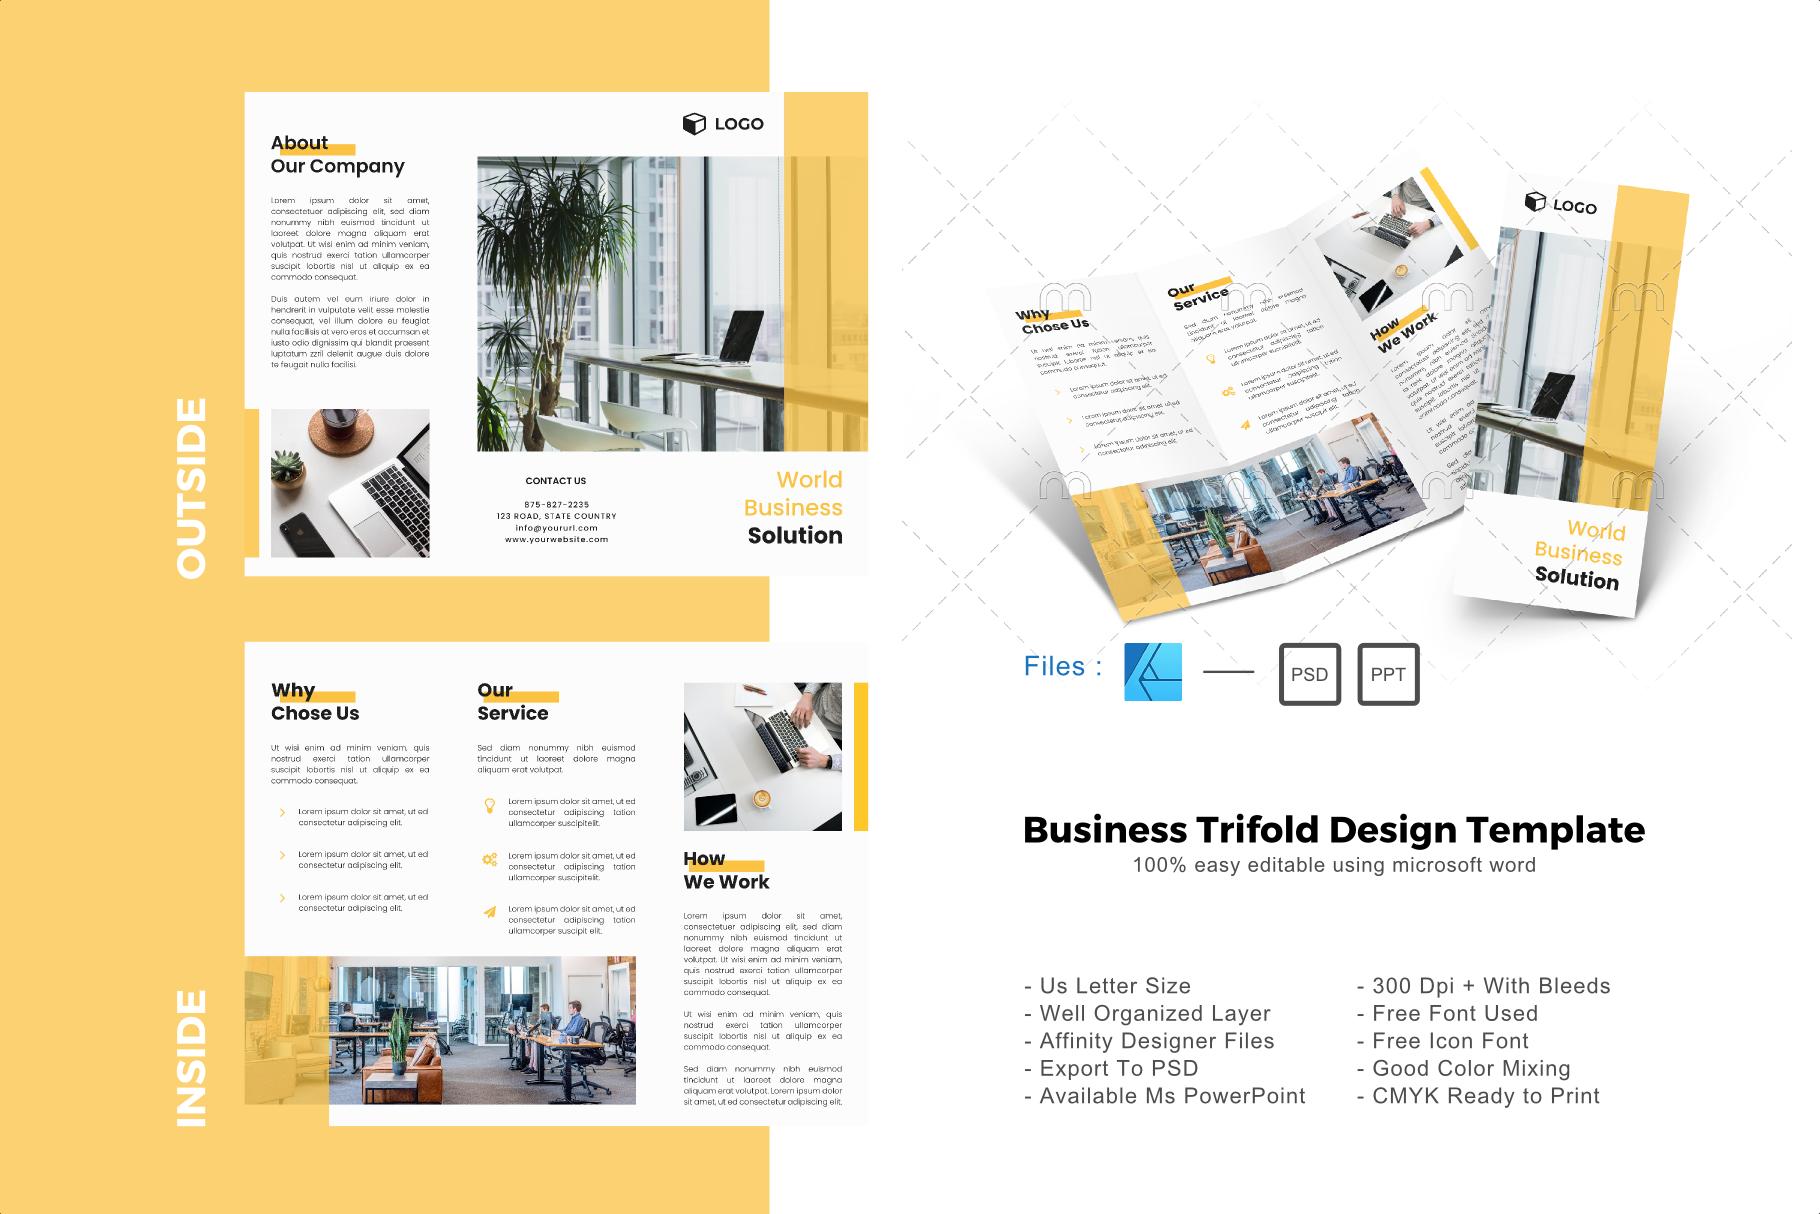 Modern Trifold Brochure Design Template Graphic By Rivatxfz Creative Fabrica